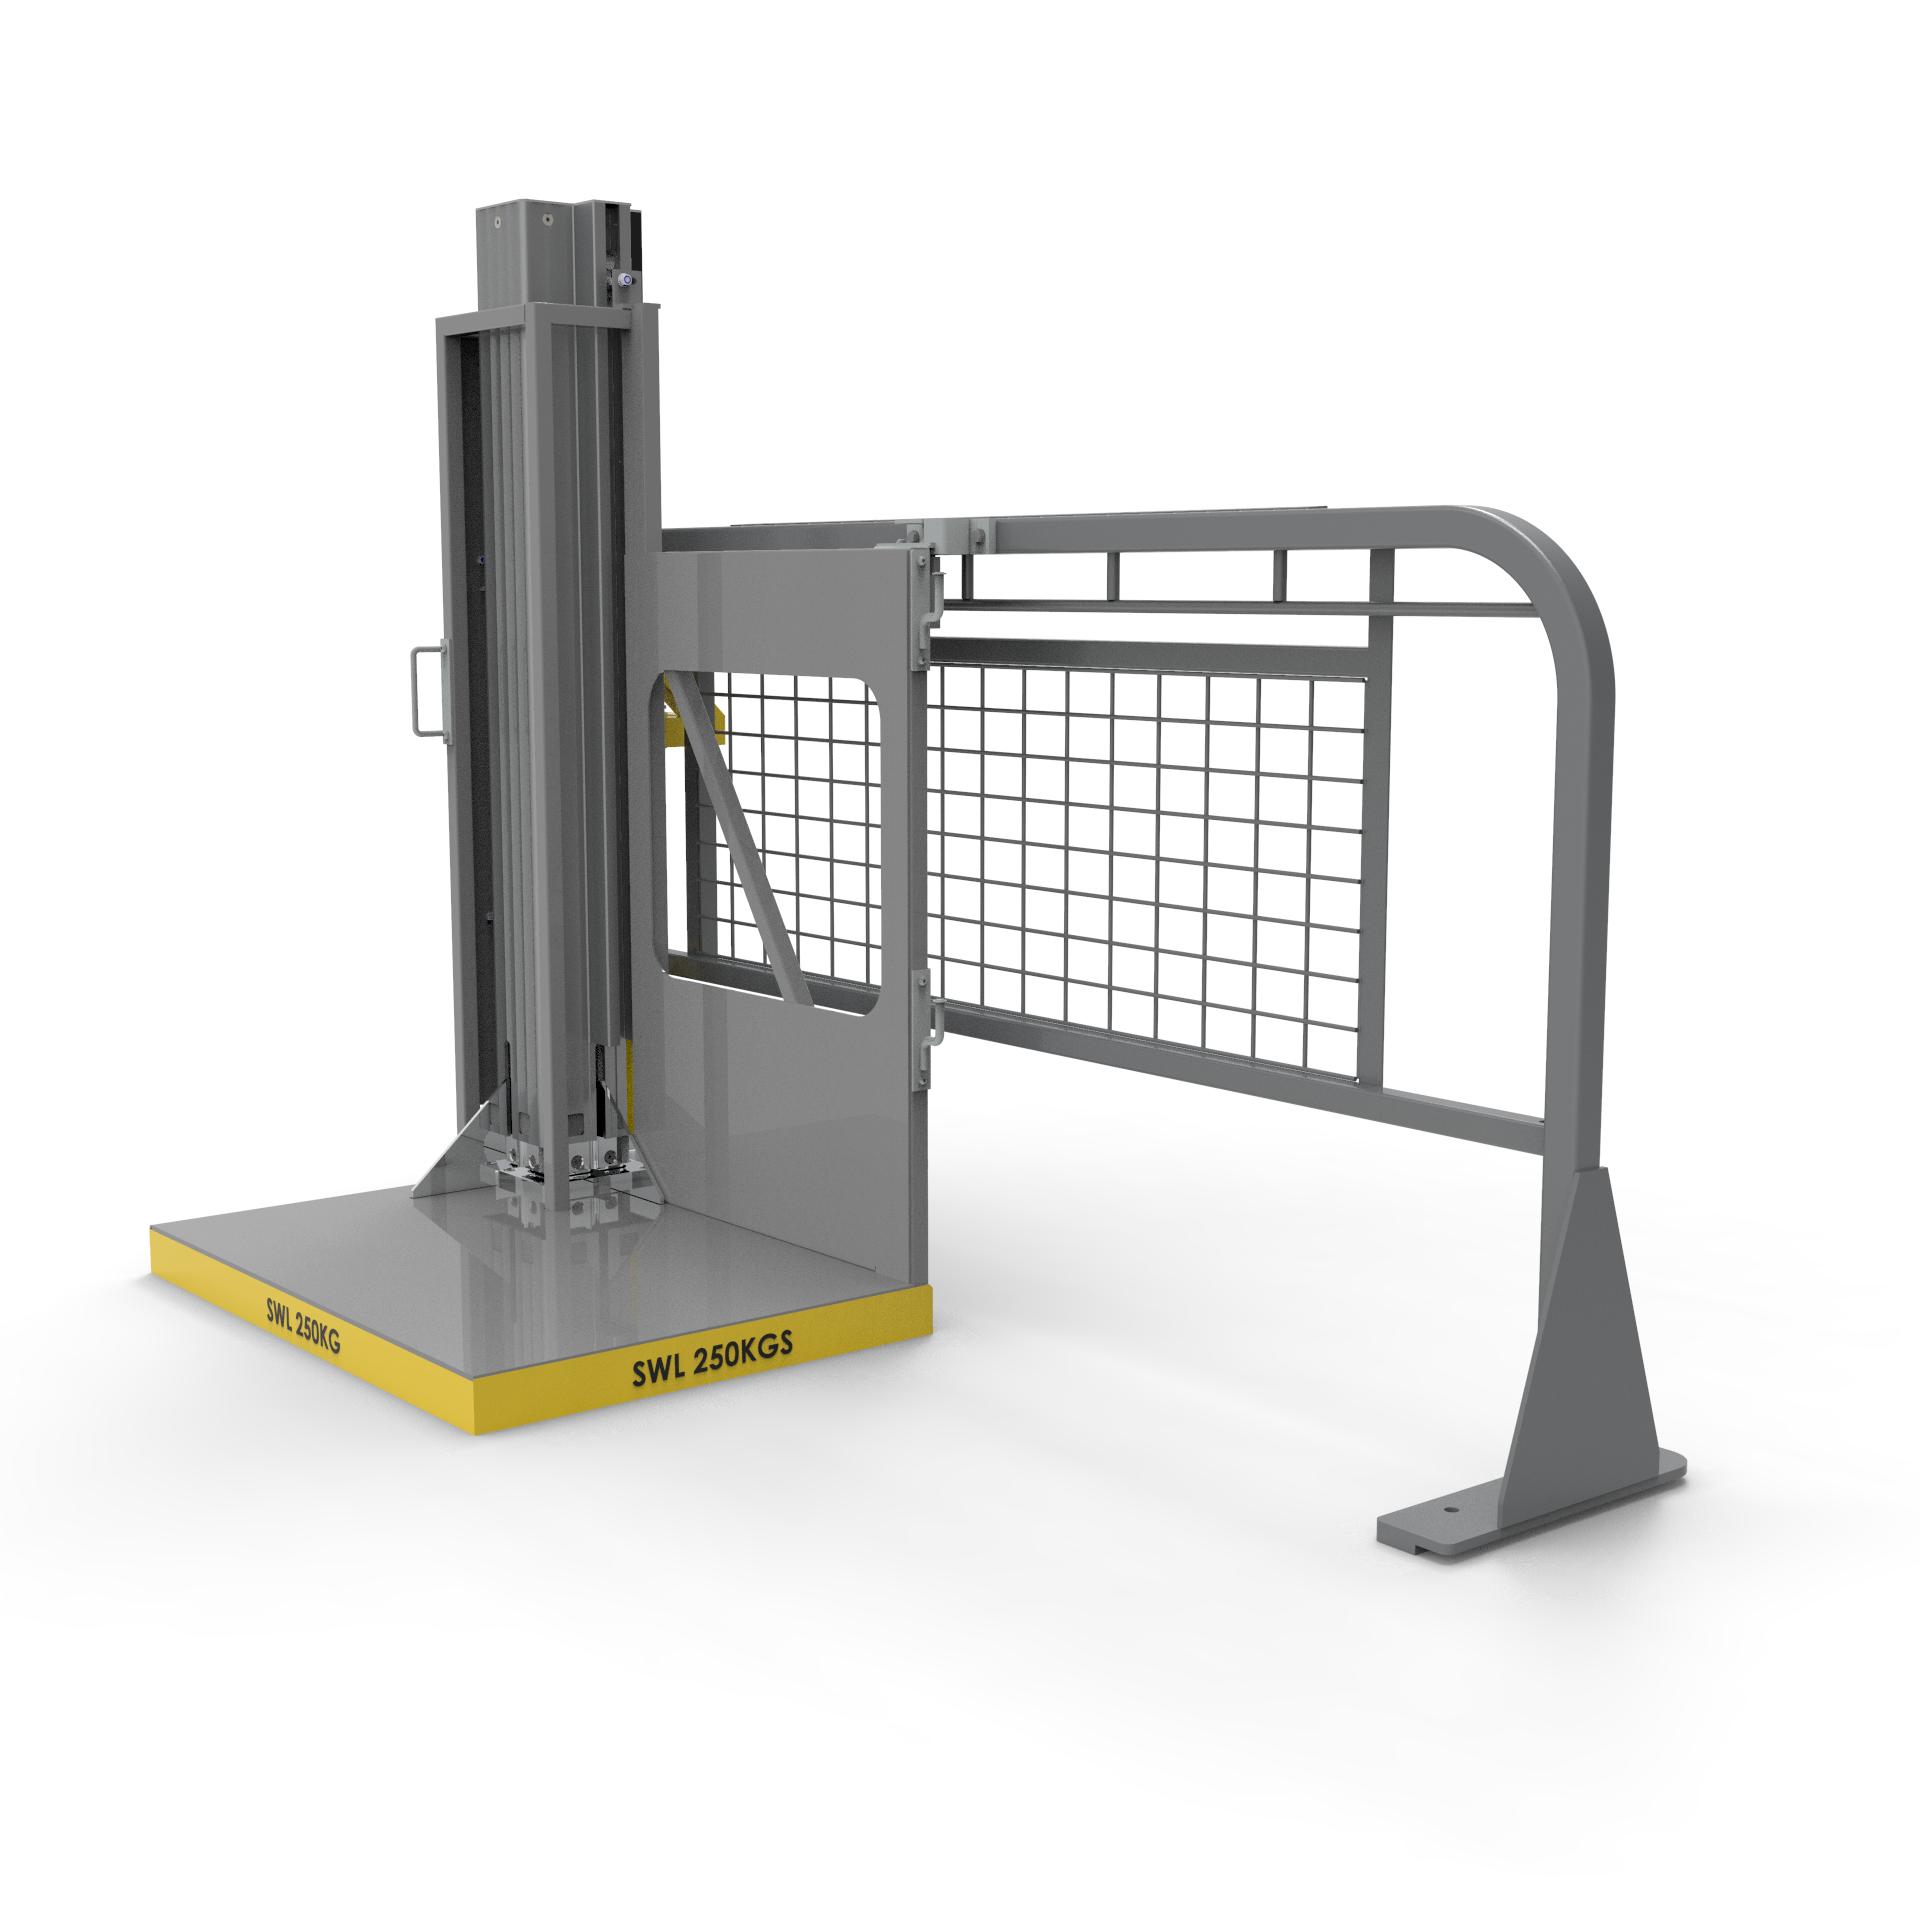 corner view of EZ Lift-N-Load side lifter